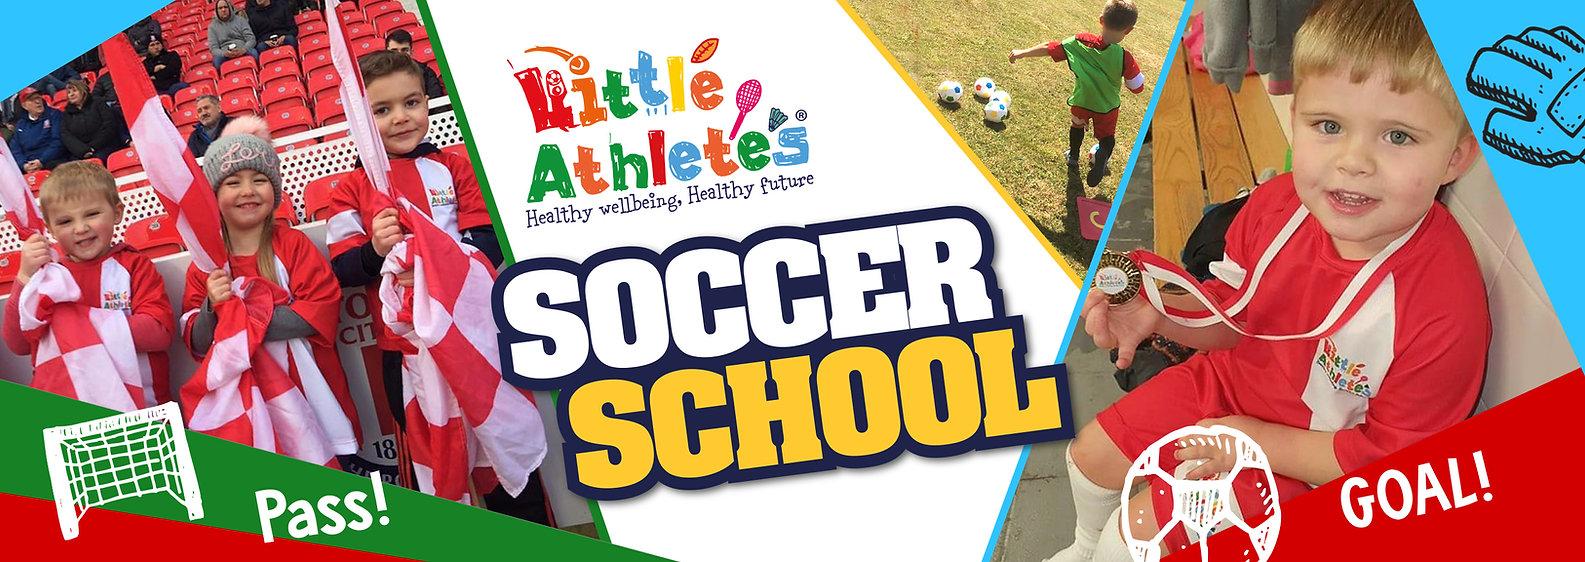 WebHeaders_SoccerSchool.jpg